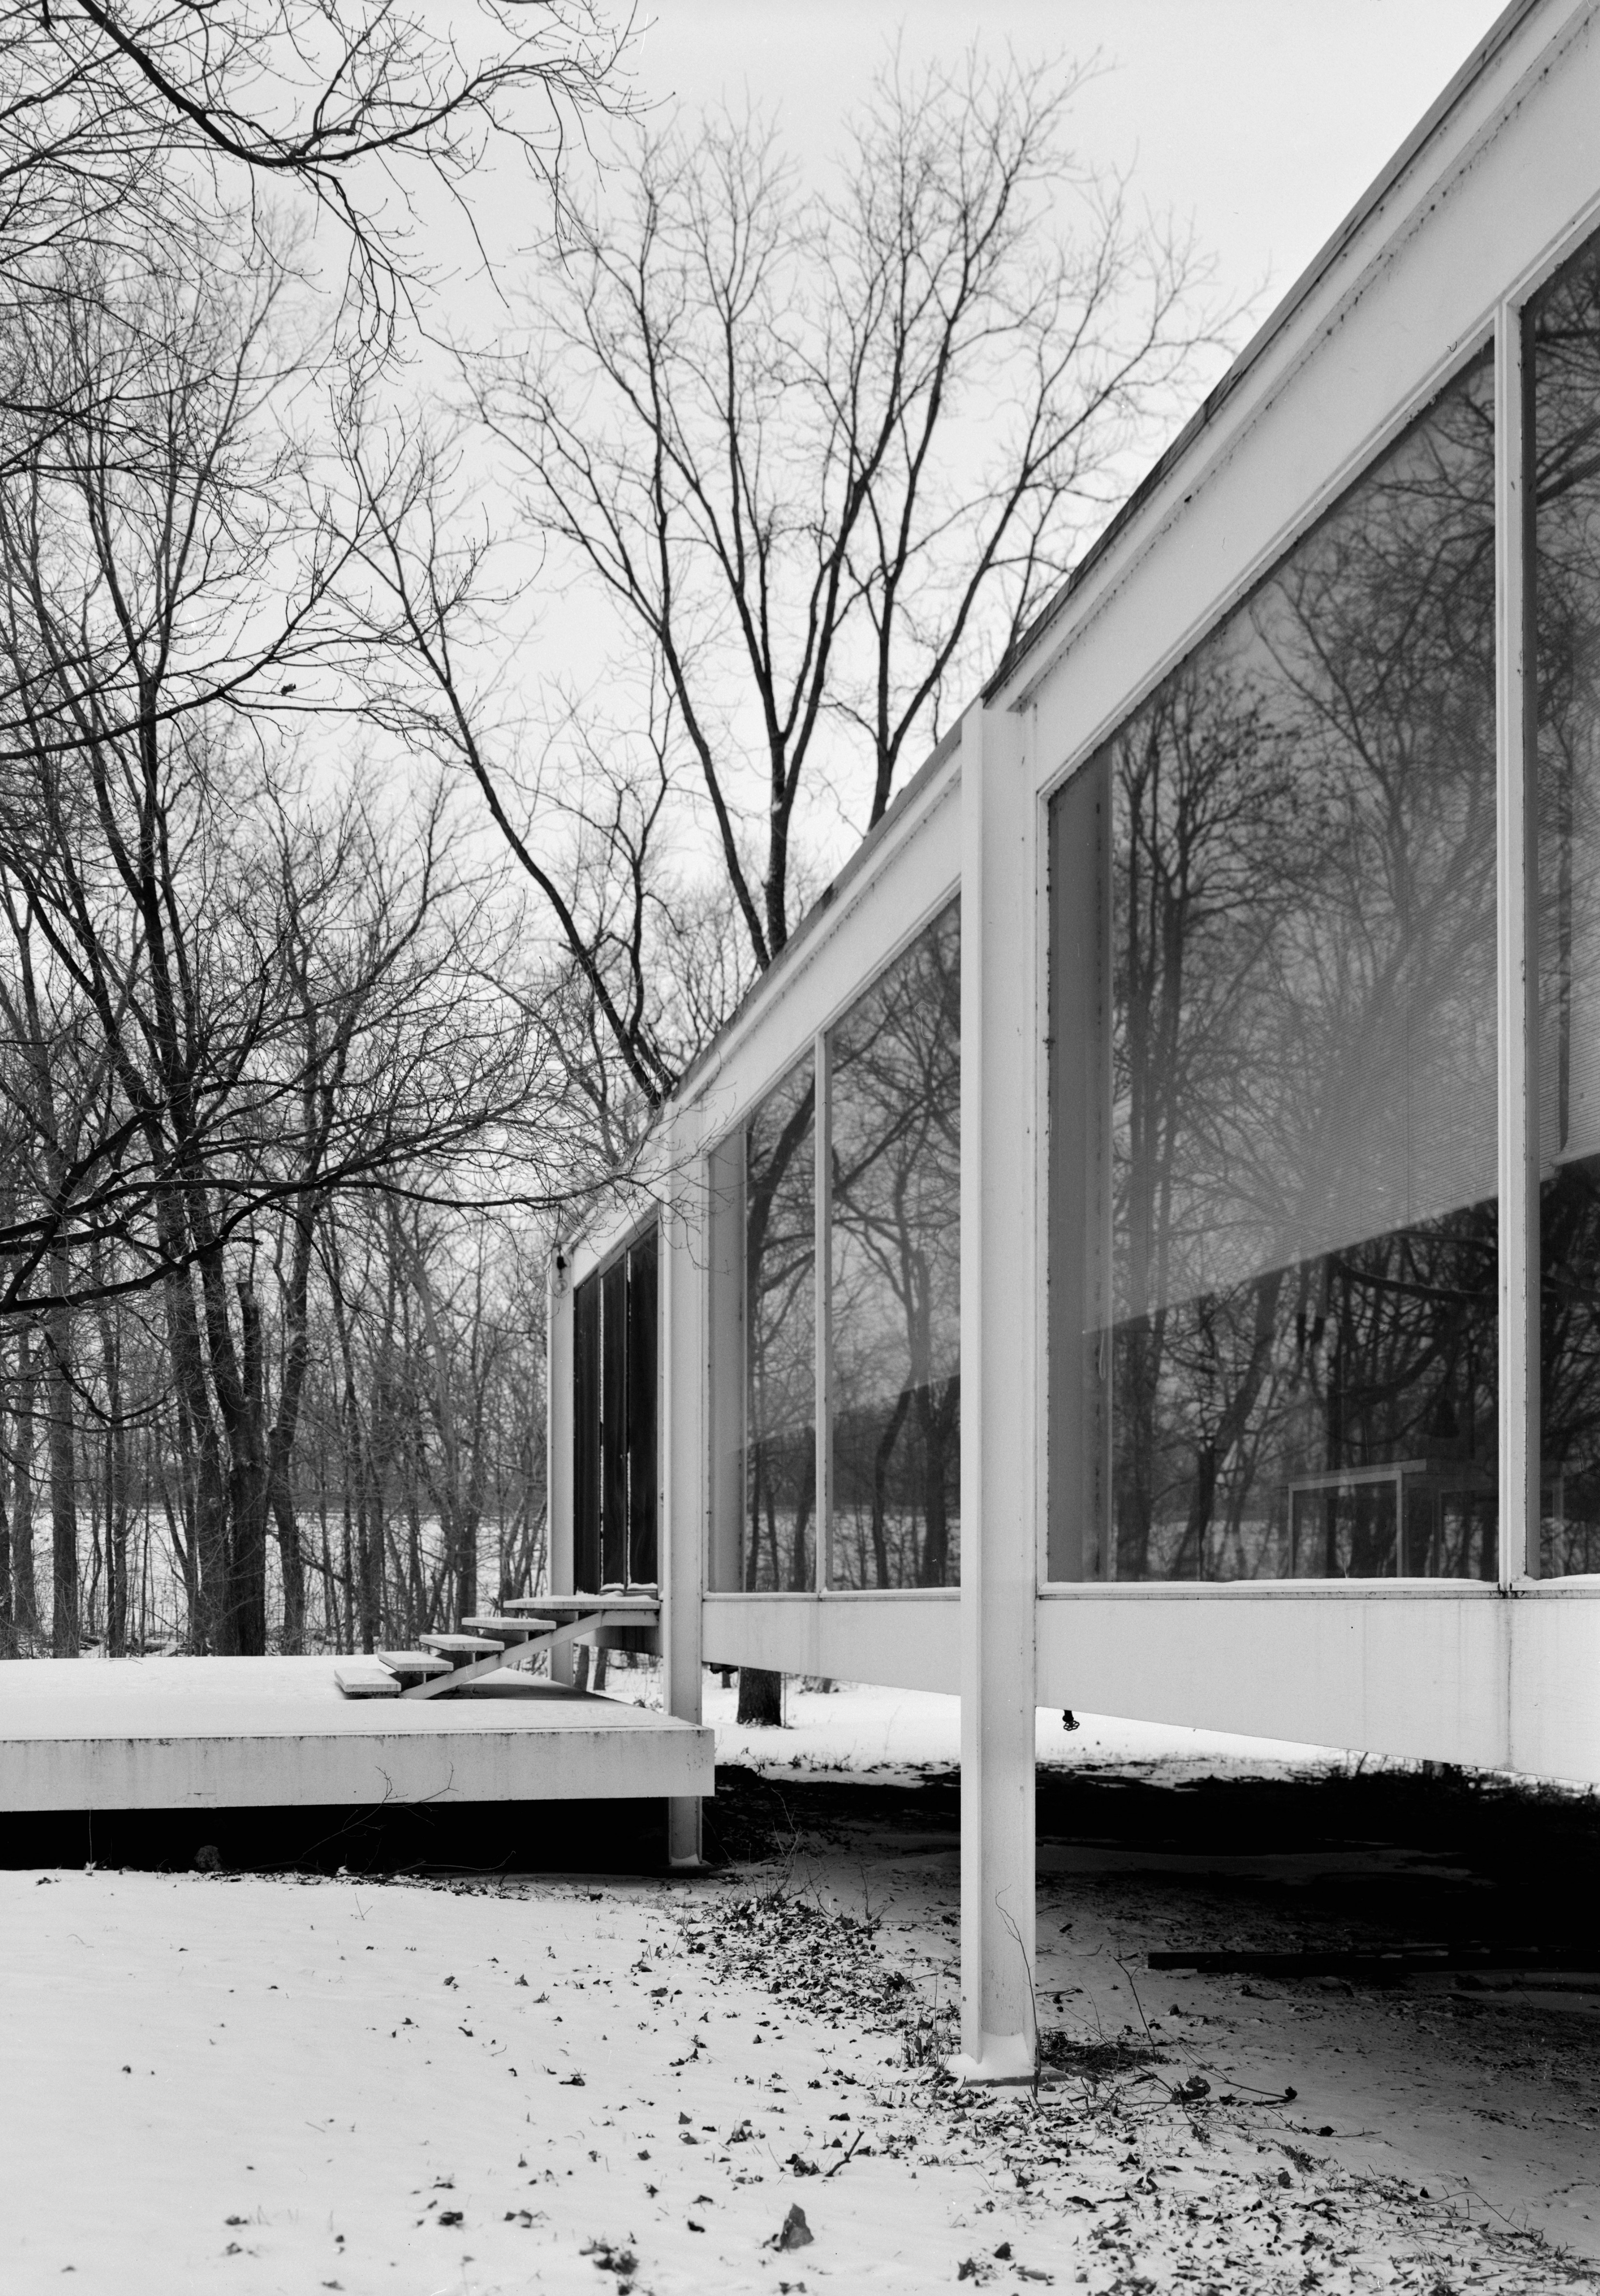 Mies_van_der_Rohe_photo_Farnsworth_House_Plano_USA_5